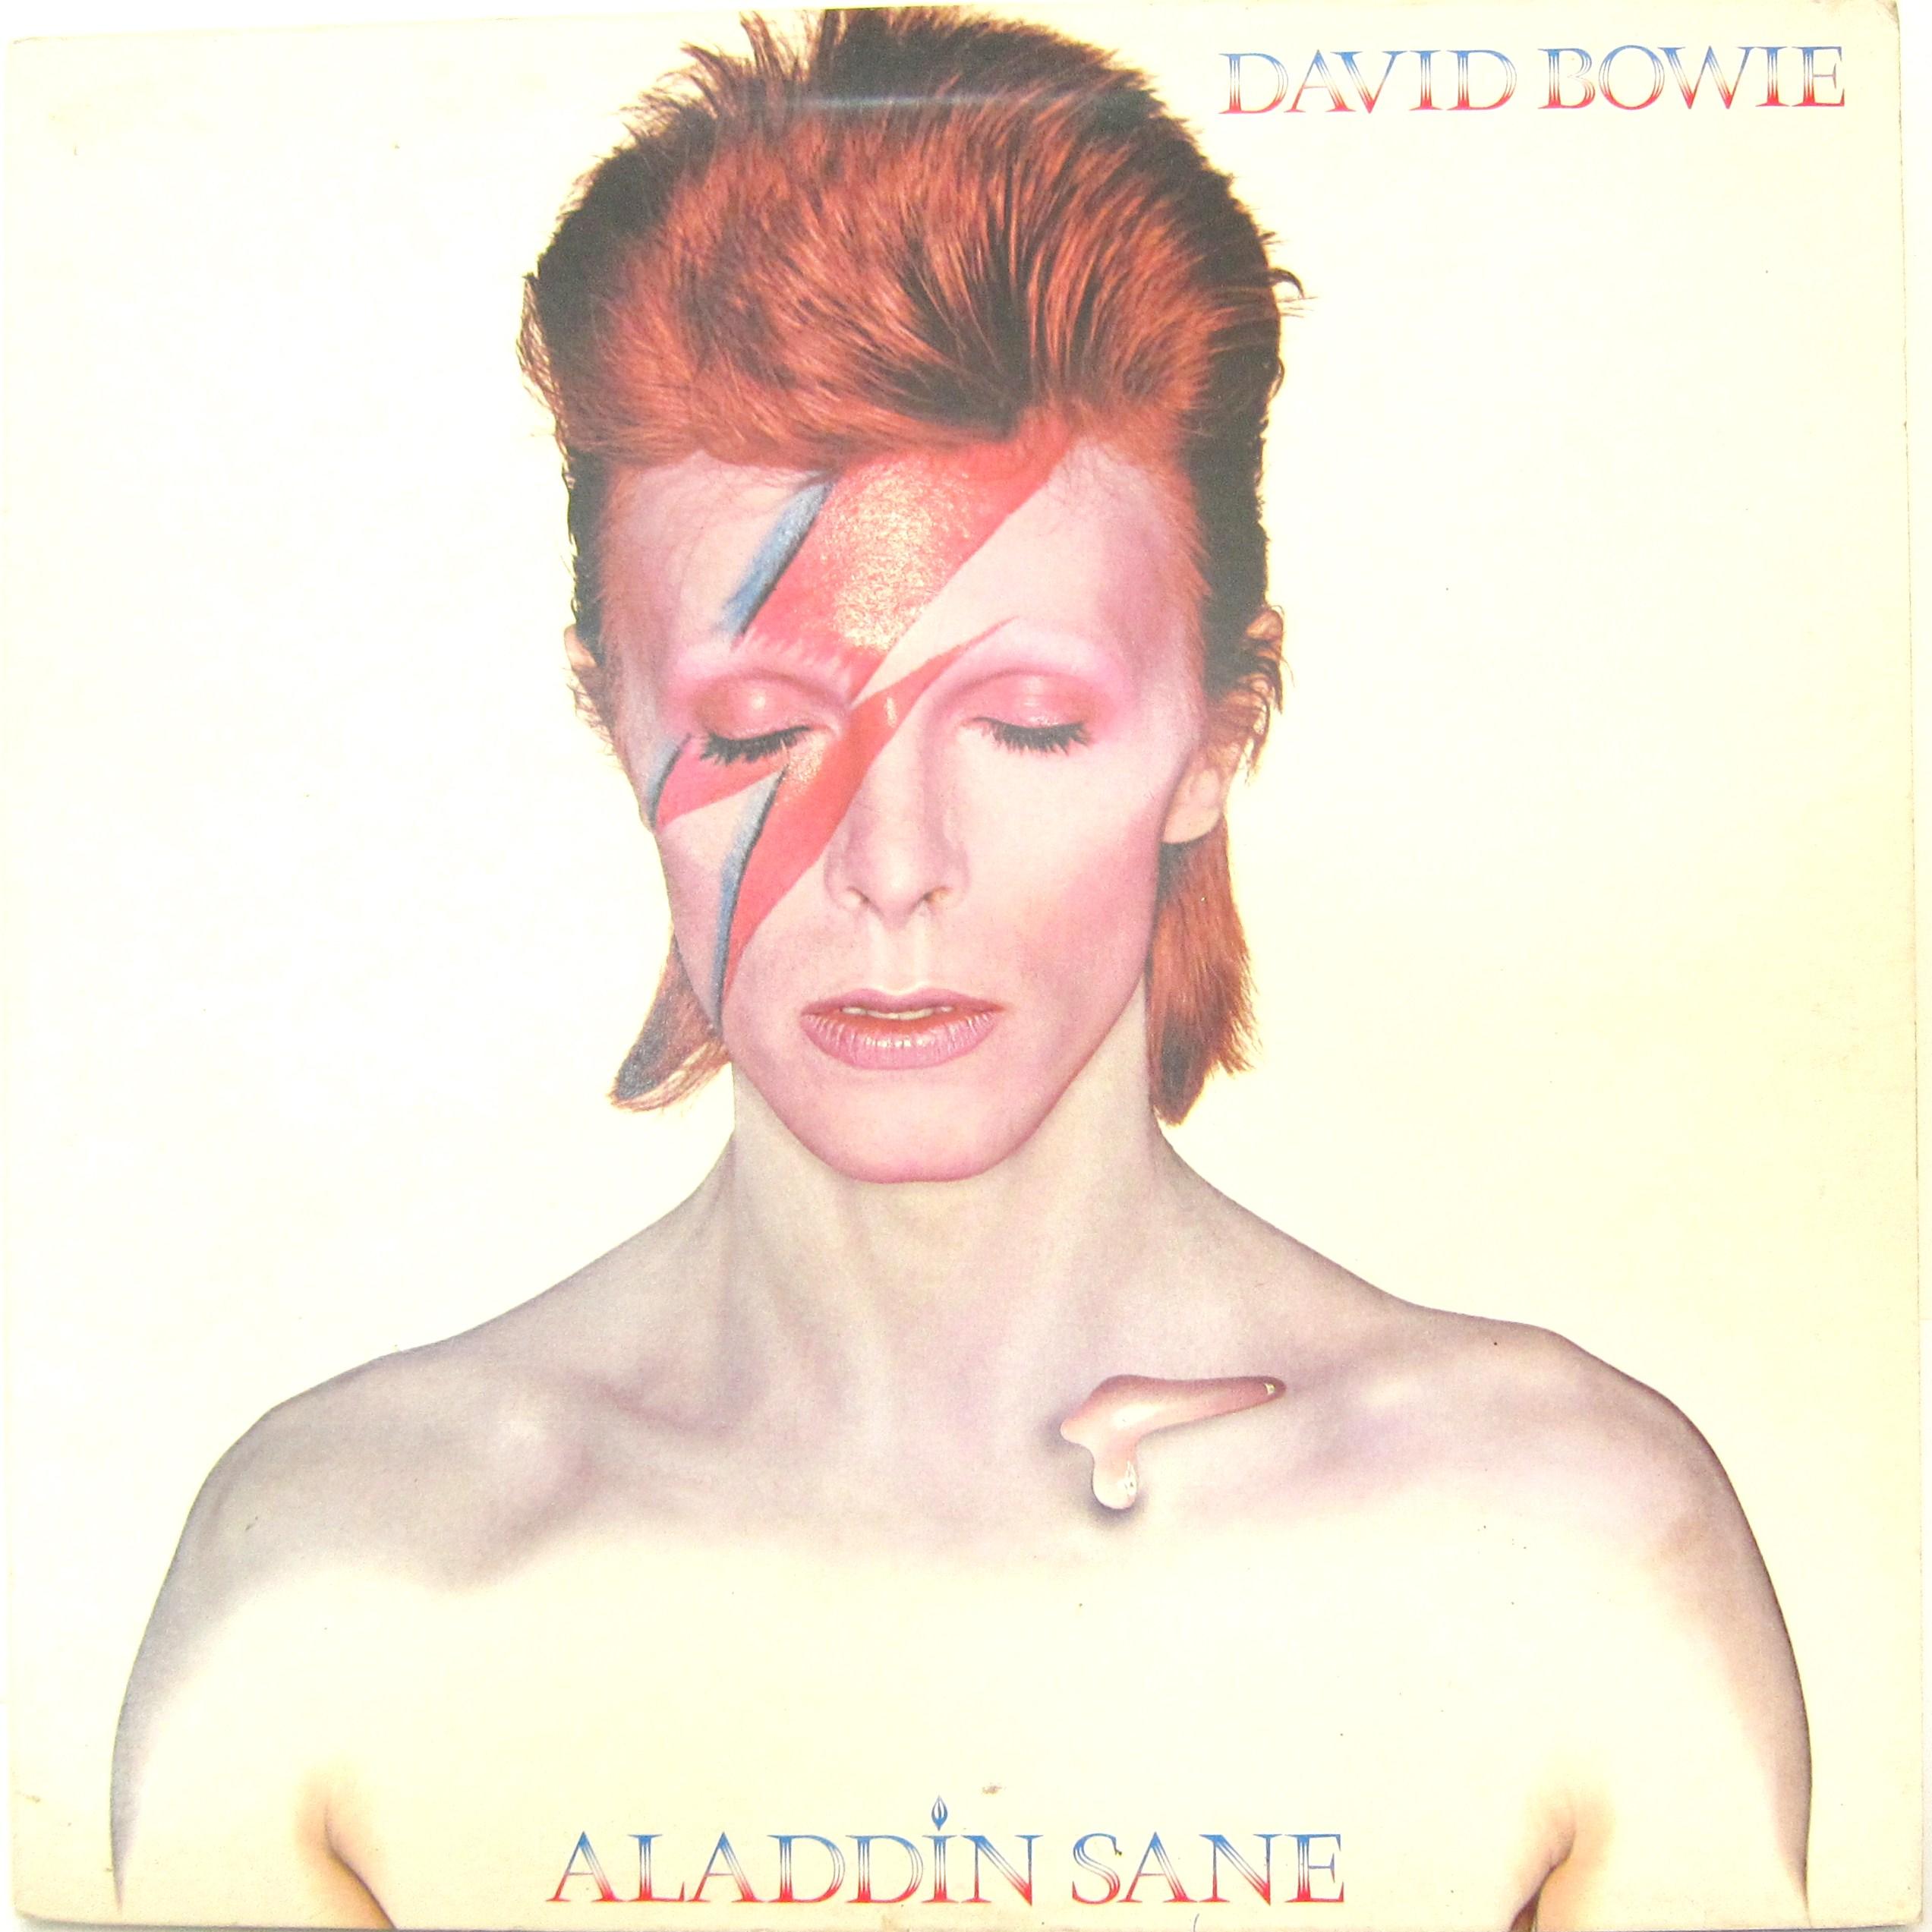 Aladdin Sane Album Cover David Bowie Every Record Tells